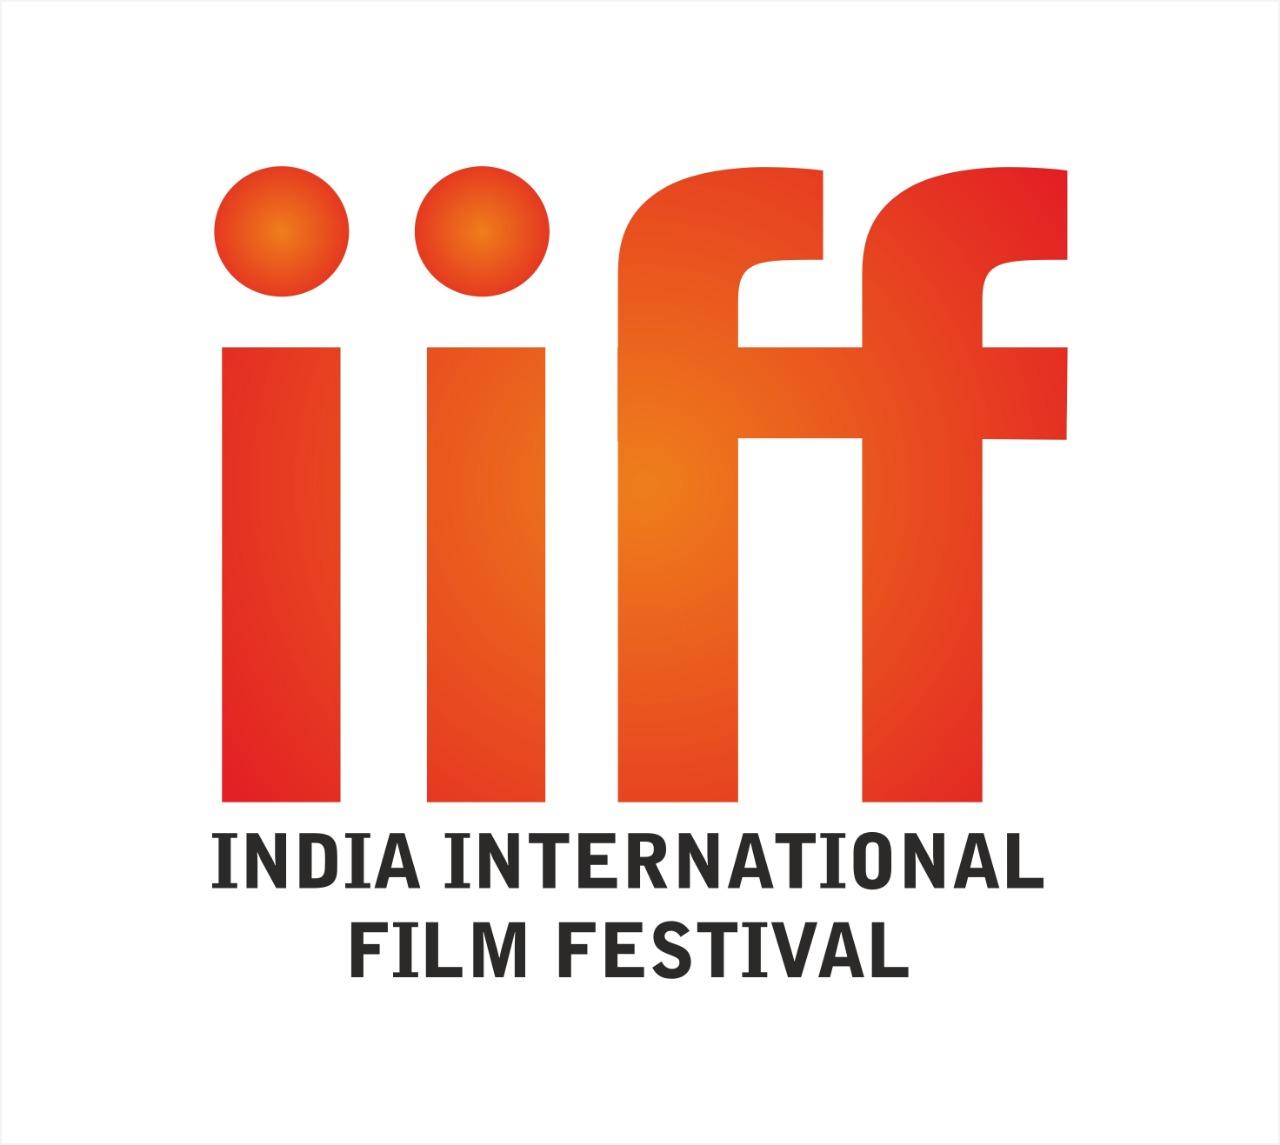 IIFF-India International Film Festival